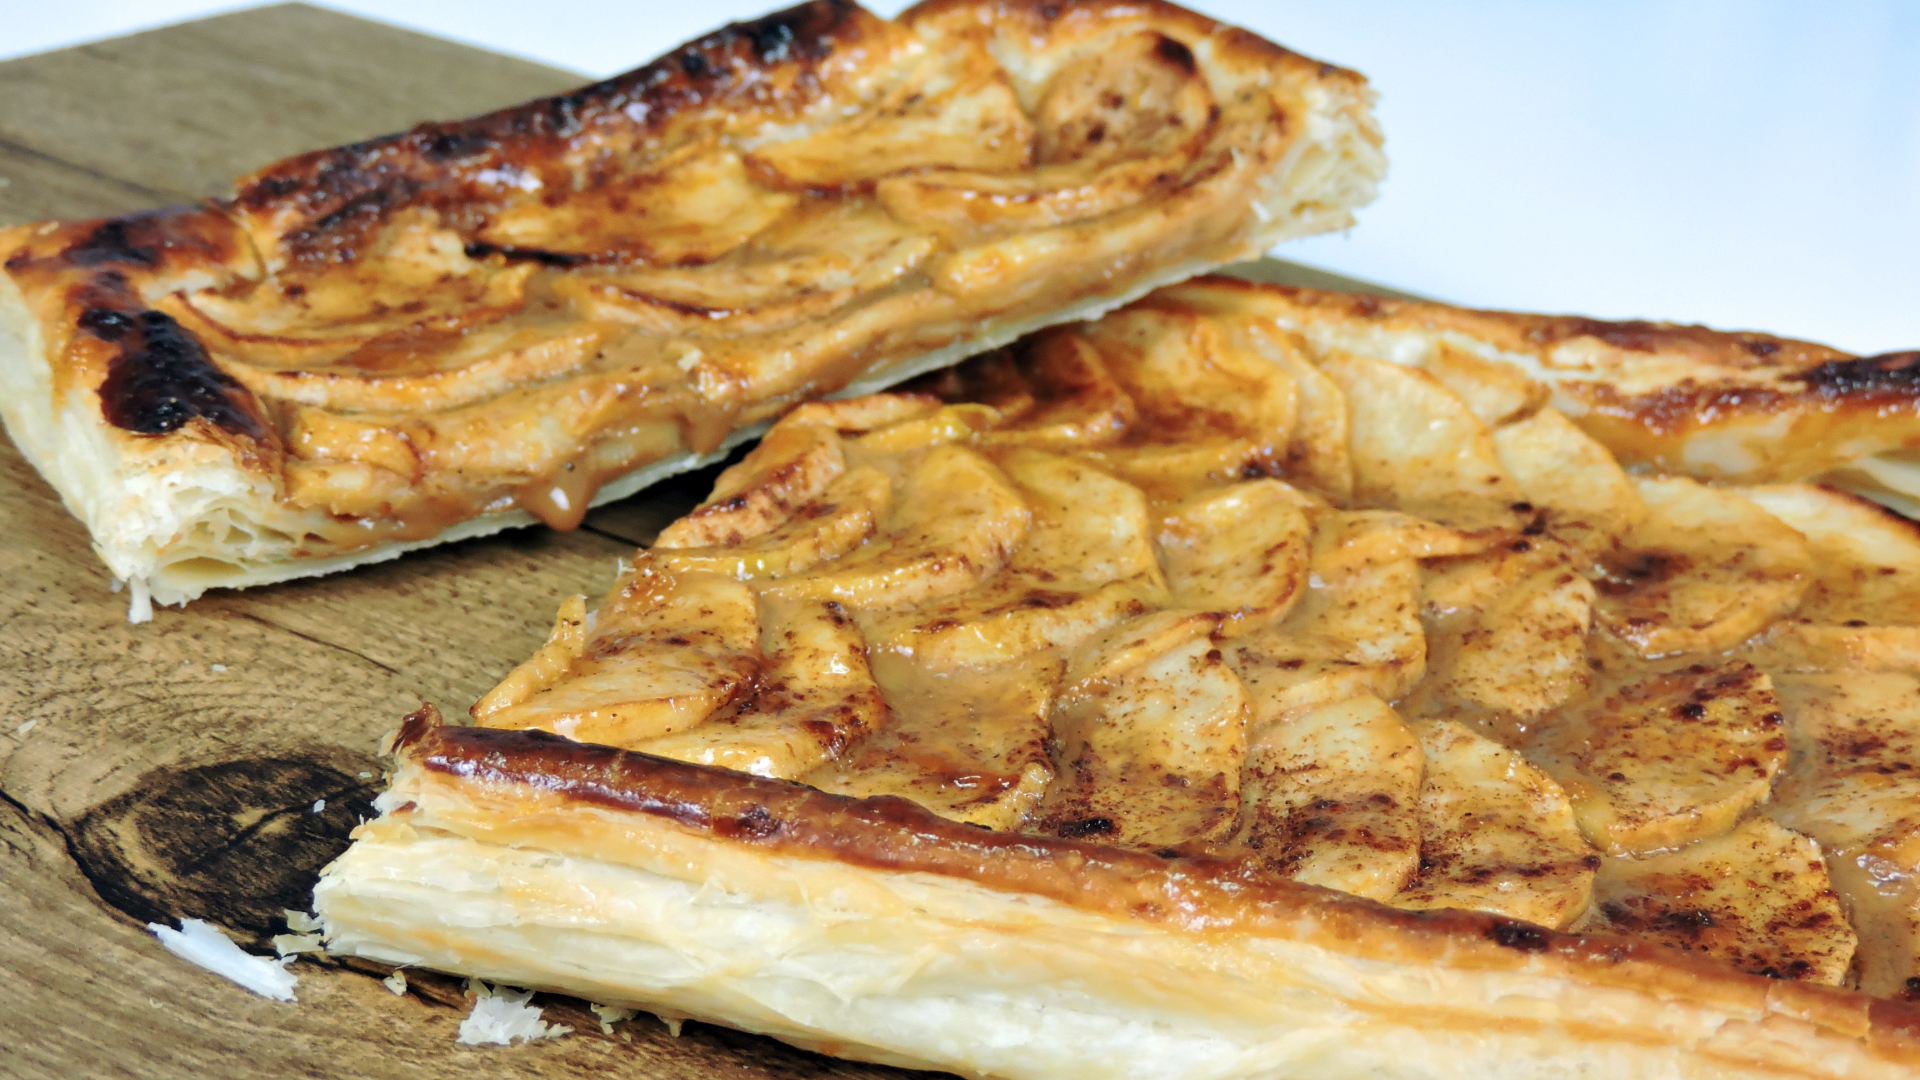 Tarta de manzana (con hojaldre y dulce de leche)